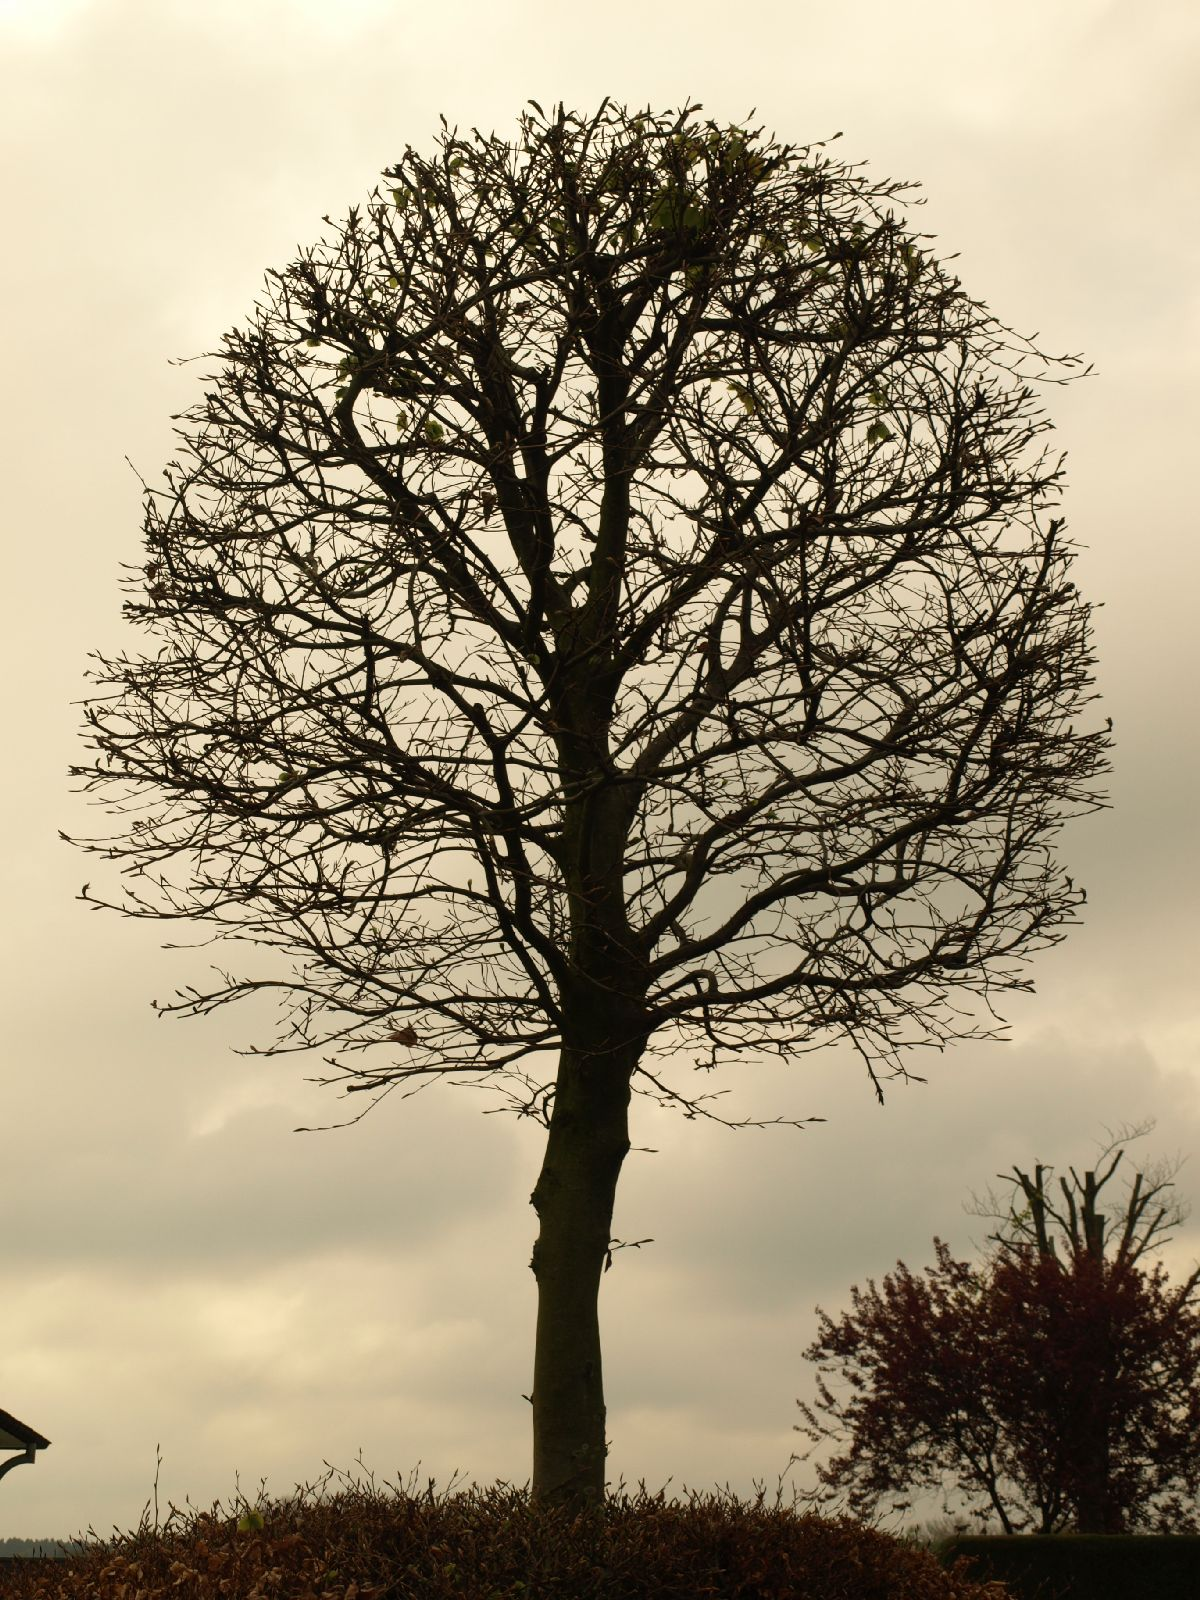 Plants-Trees_Photo_Texture_B_P4232653